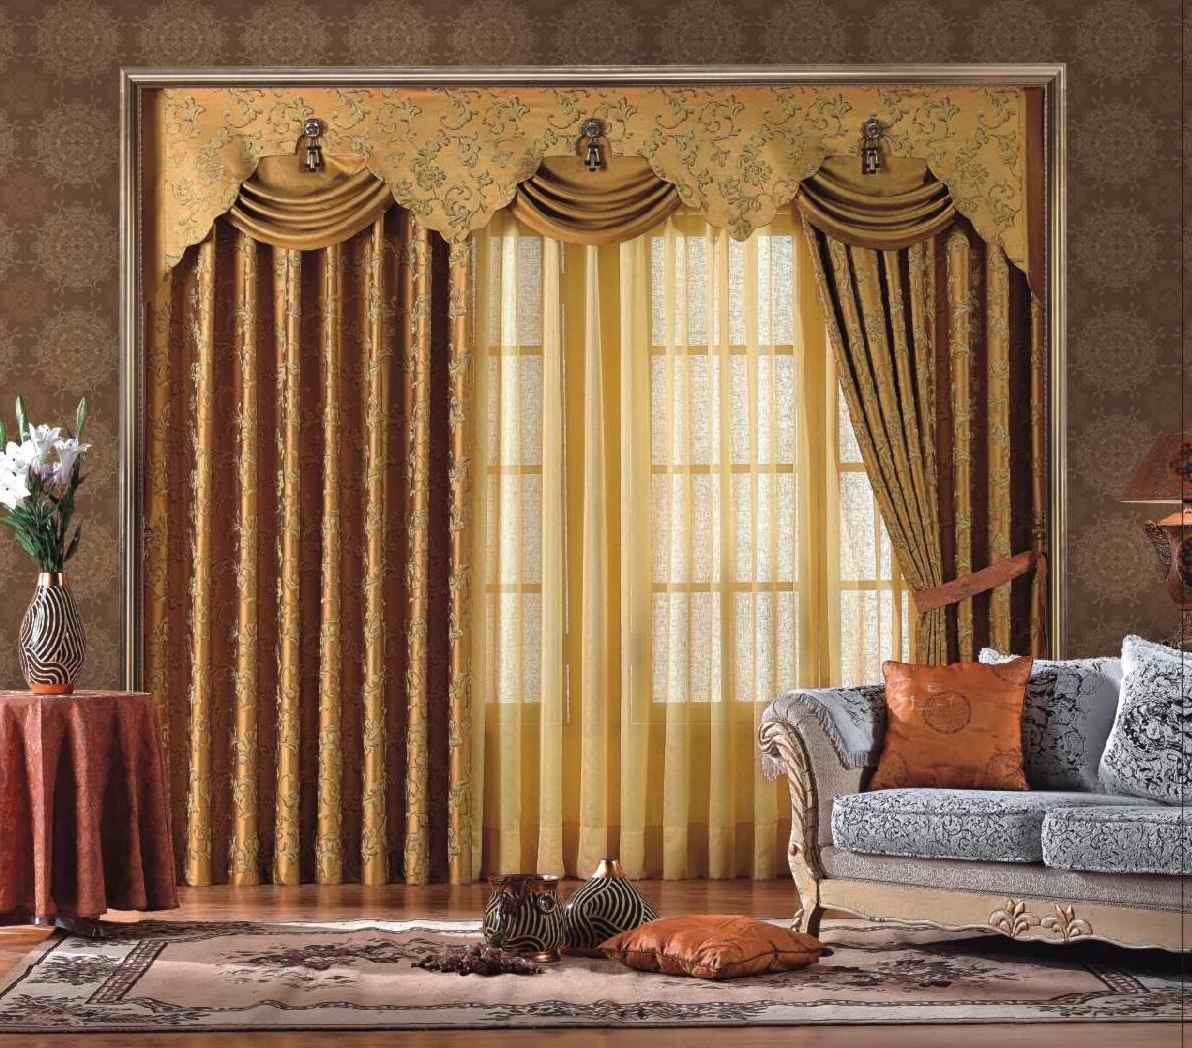 Curtain exclusive elaborate window treatments n headboards